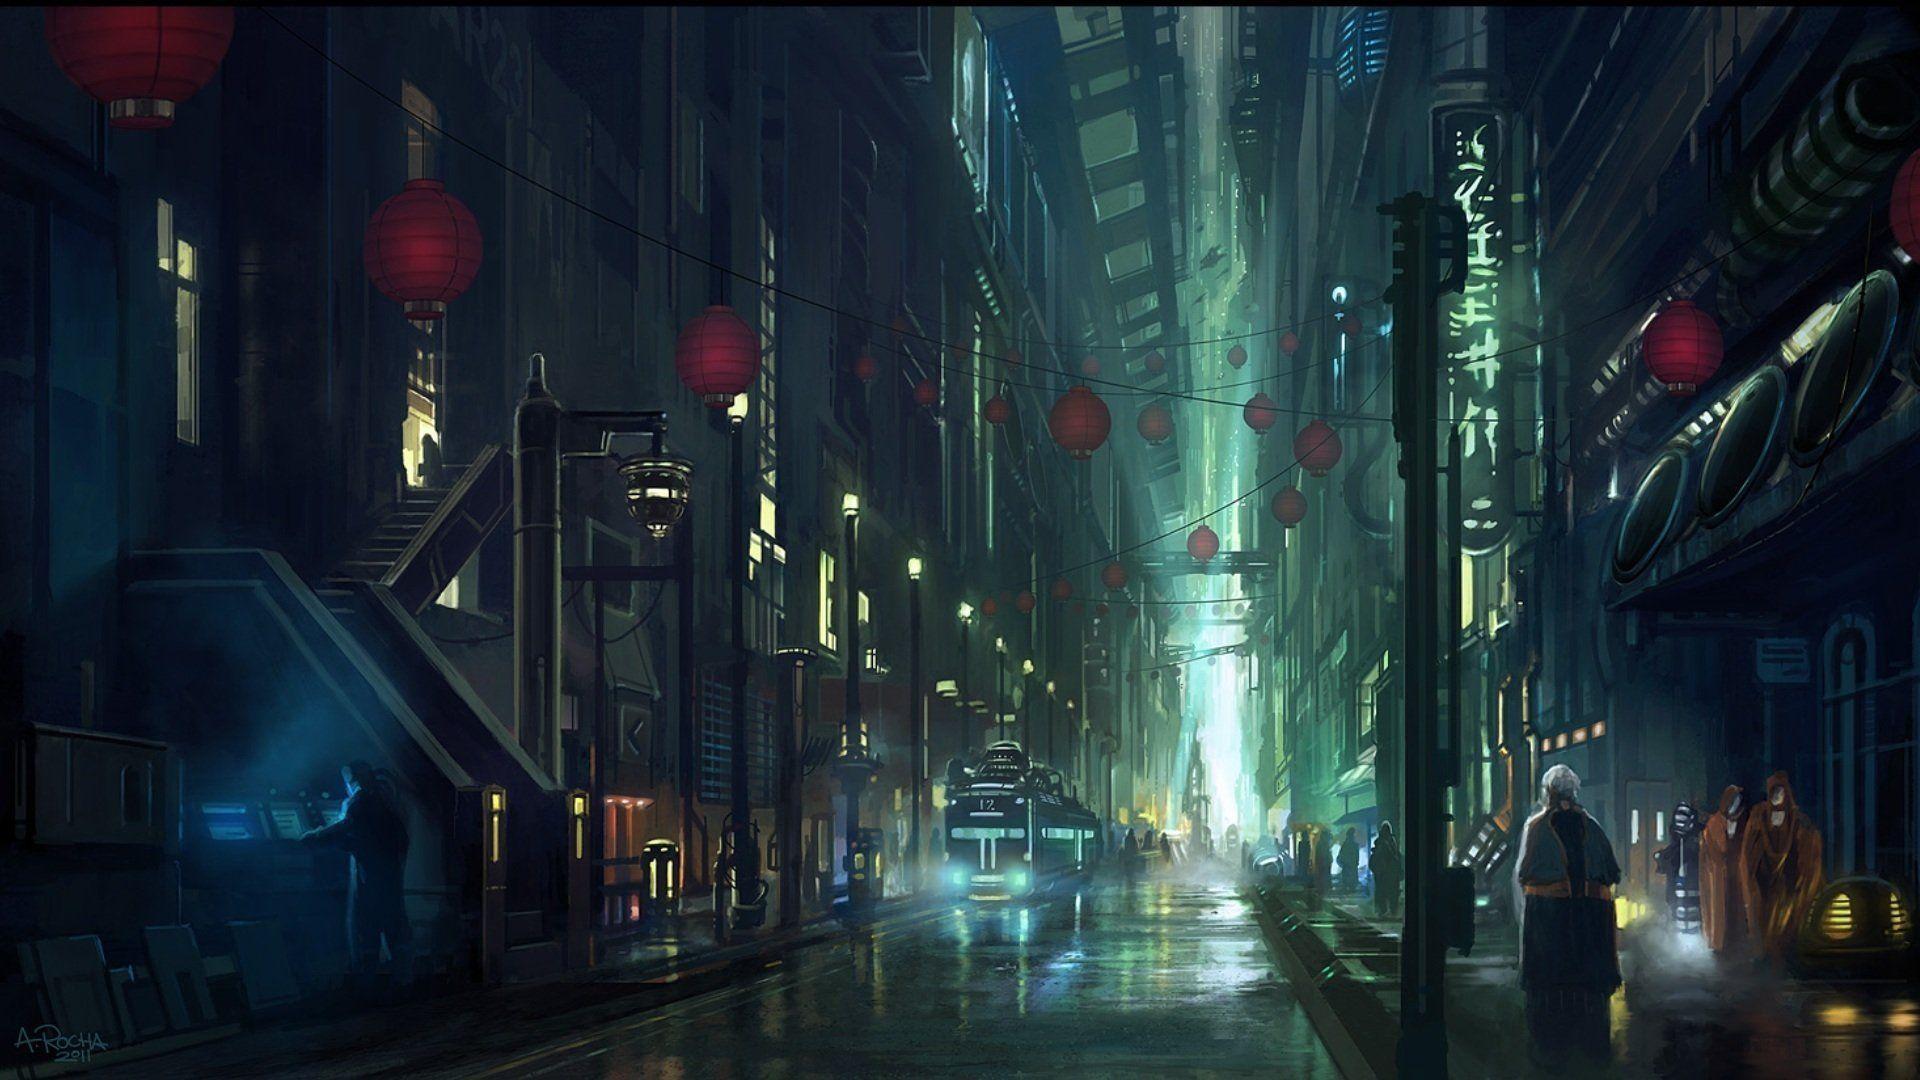 Blade Runner Digital Wallpapers Top Free Blade Runner